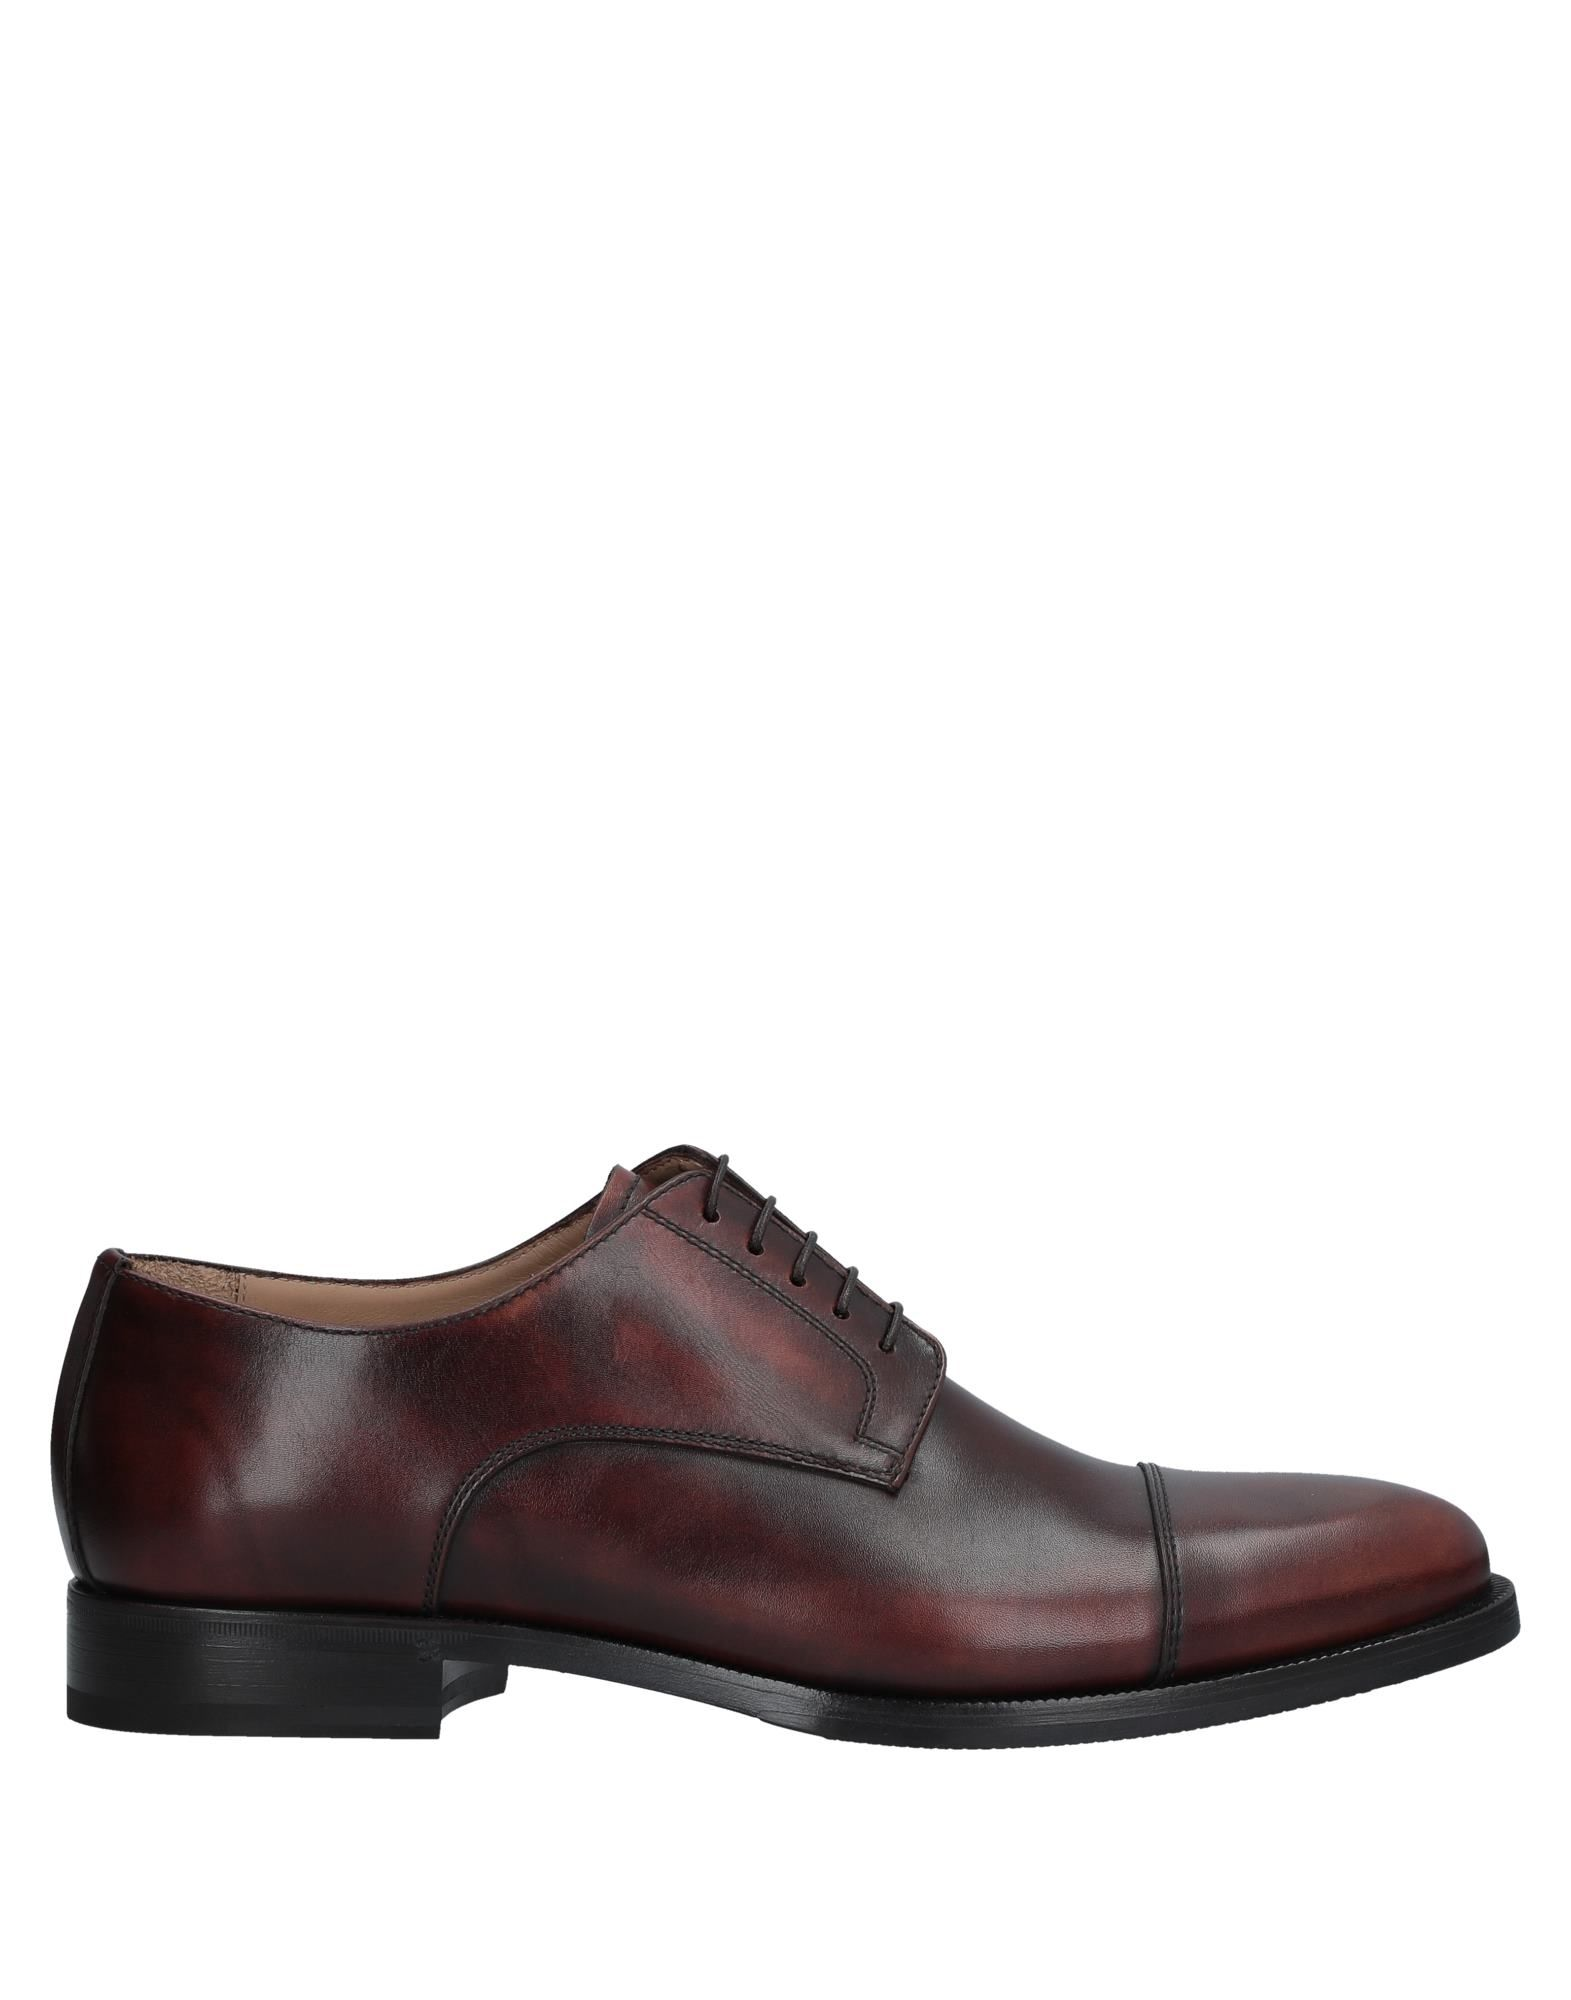 Fabi Mokassins Herren  11543197UV Gute Qualität beliebte Schuhe